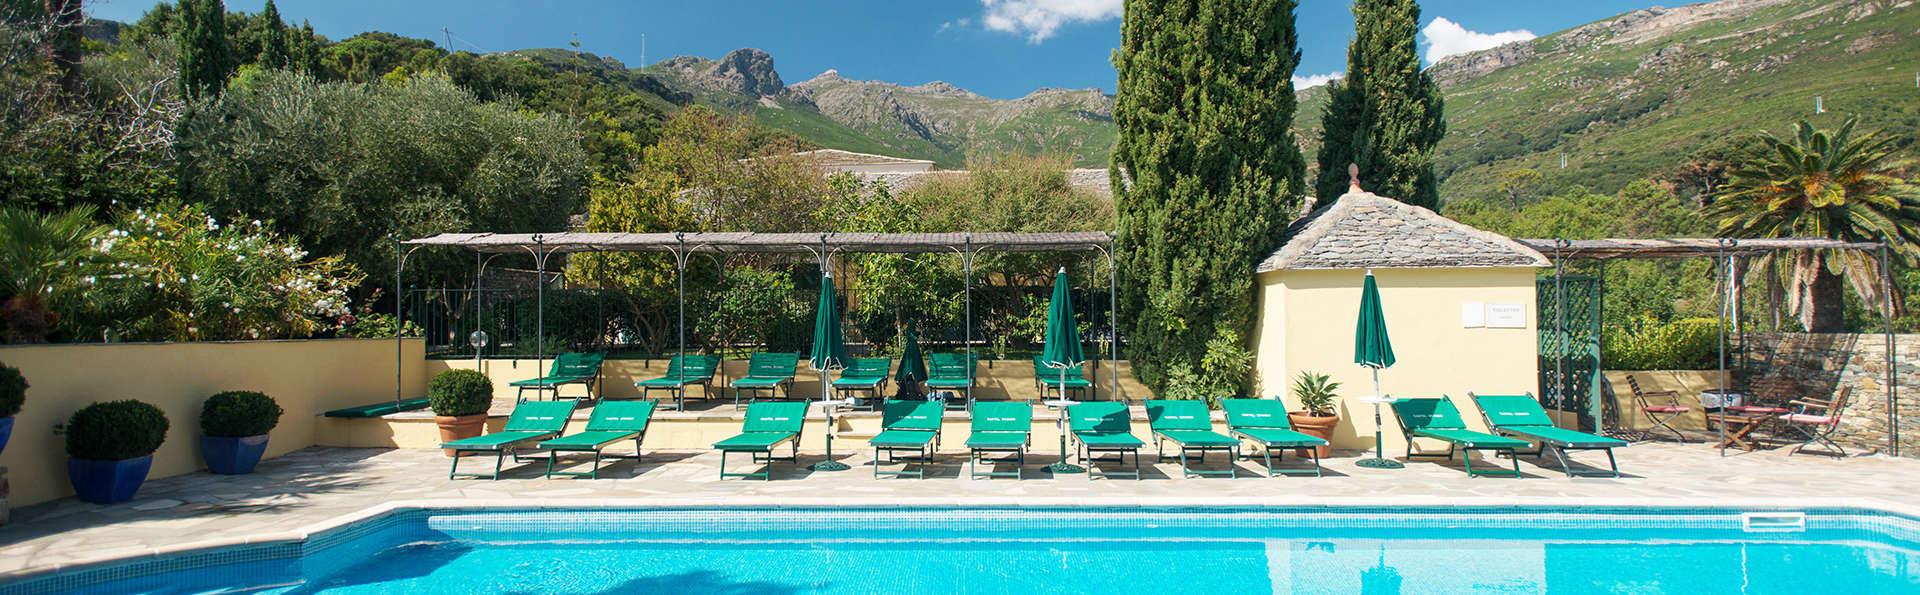 Hôtel Demeure Castel Brando - EDIT_pool.jpg